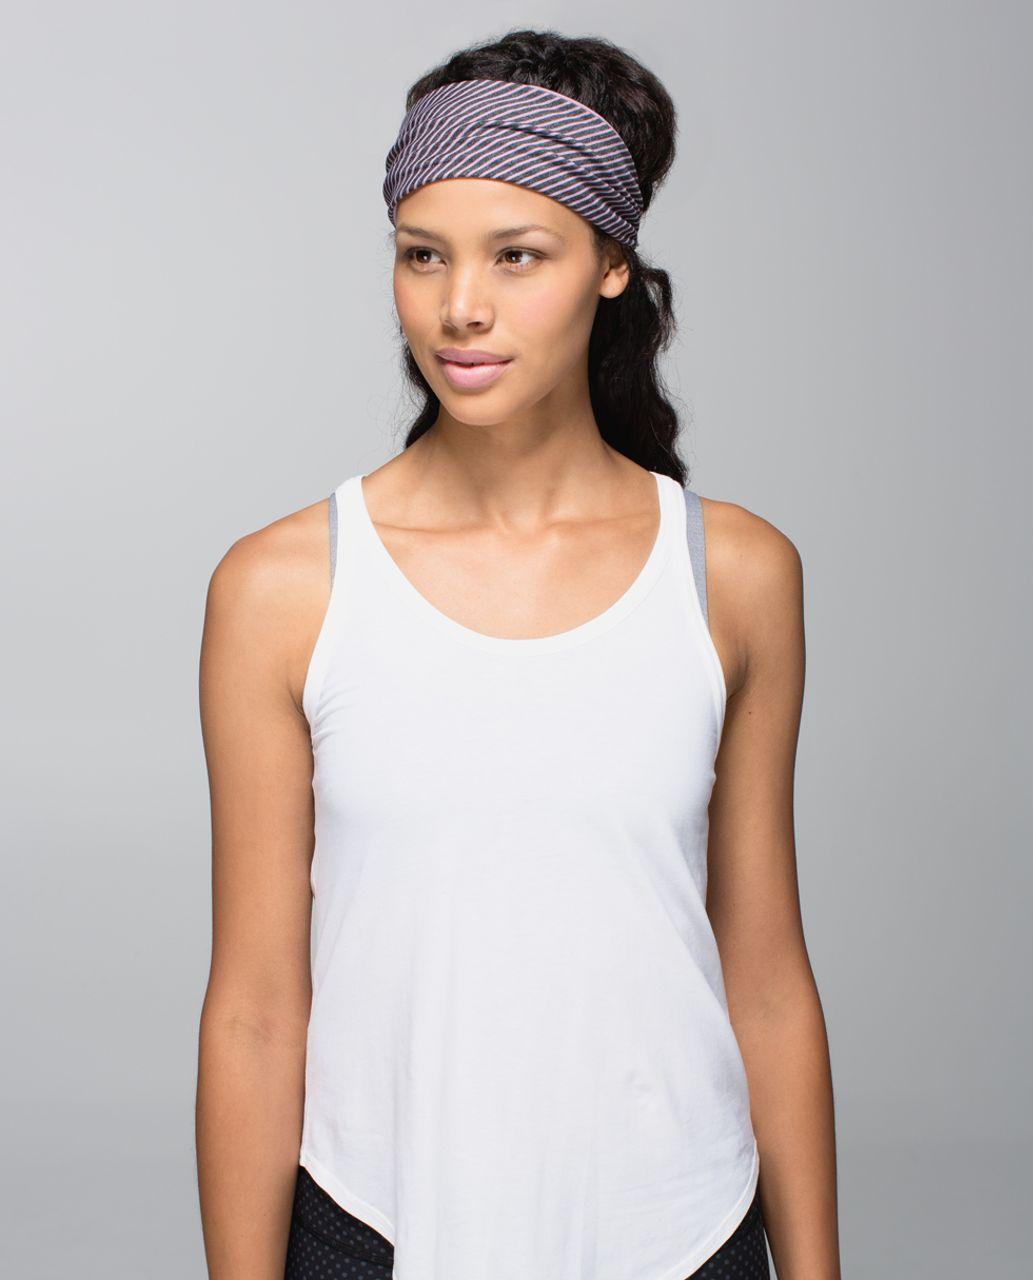 Lululemon Bang Buster Headband *Reversible - Hyper Stripe Mauvelous Heathered Black / Mauvelous